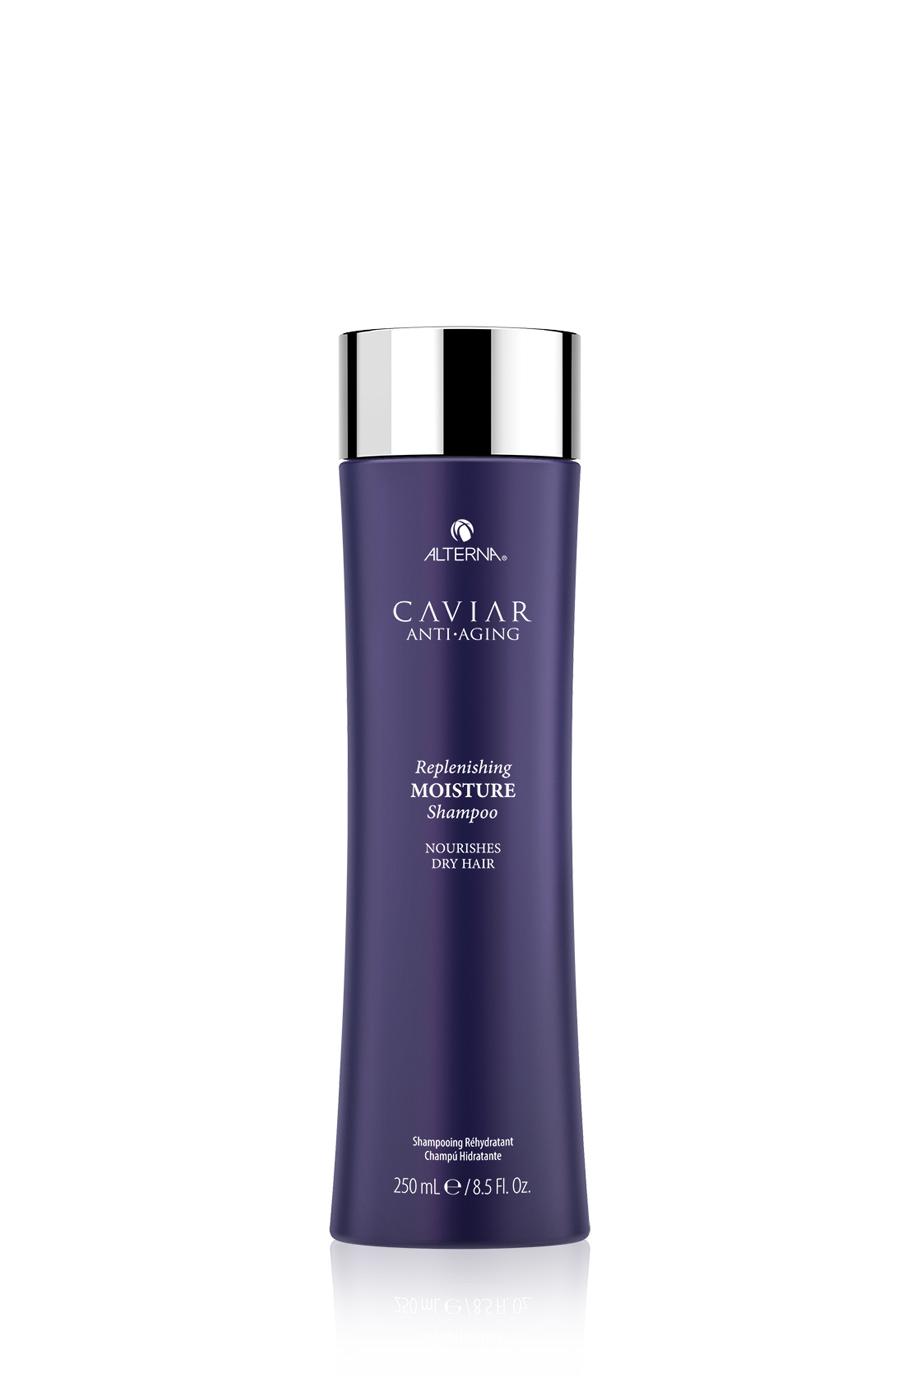 CAVIAR Anti-Aging Replenishing Moisture Shampoo Шампунь-биоревитализация для увлажнения с морским шелком, 250мл